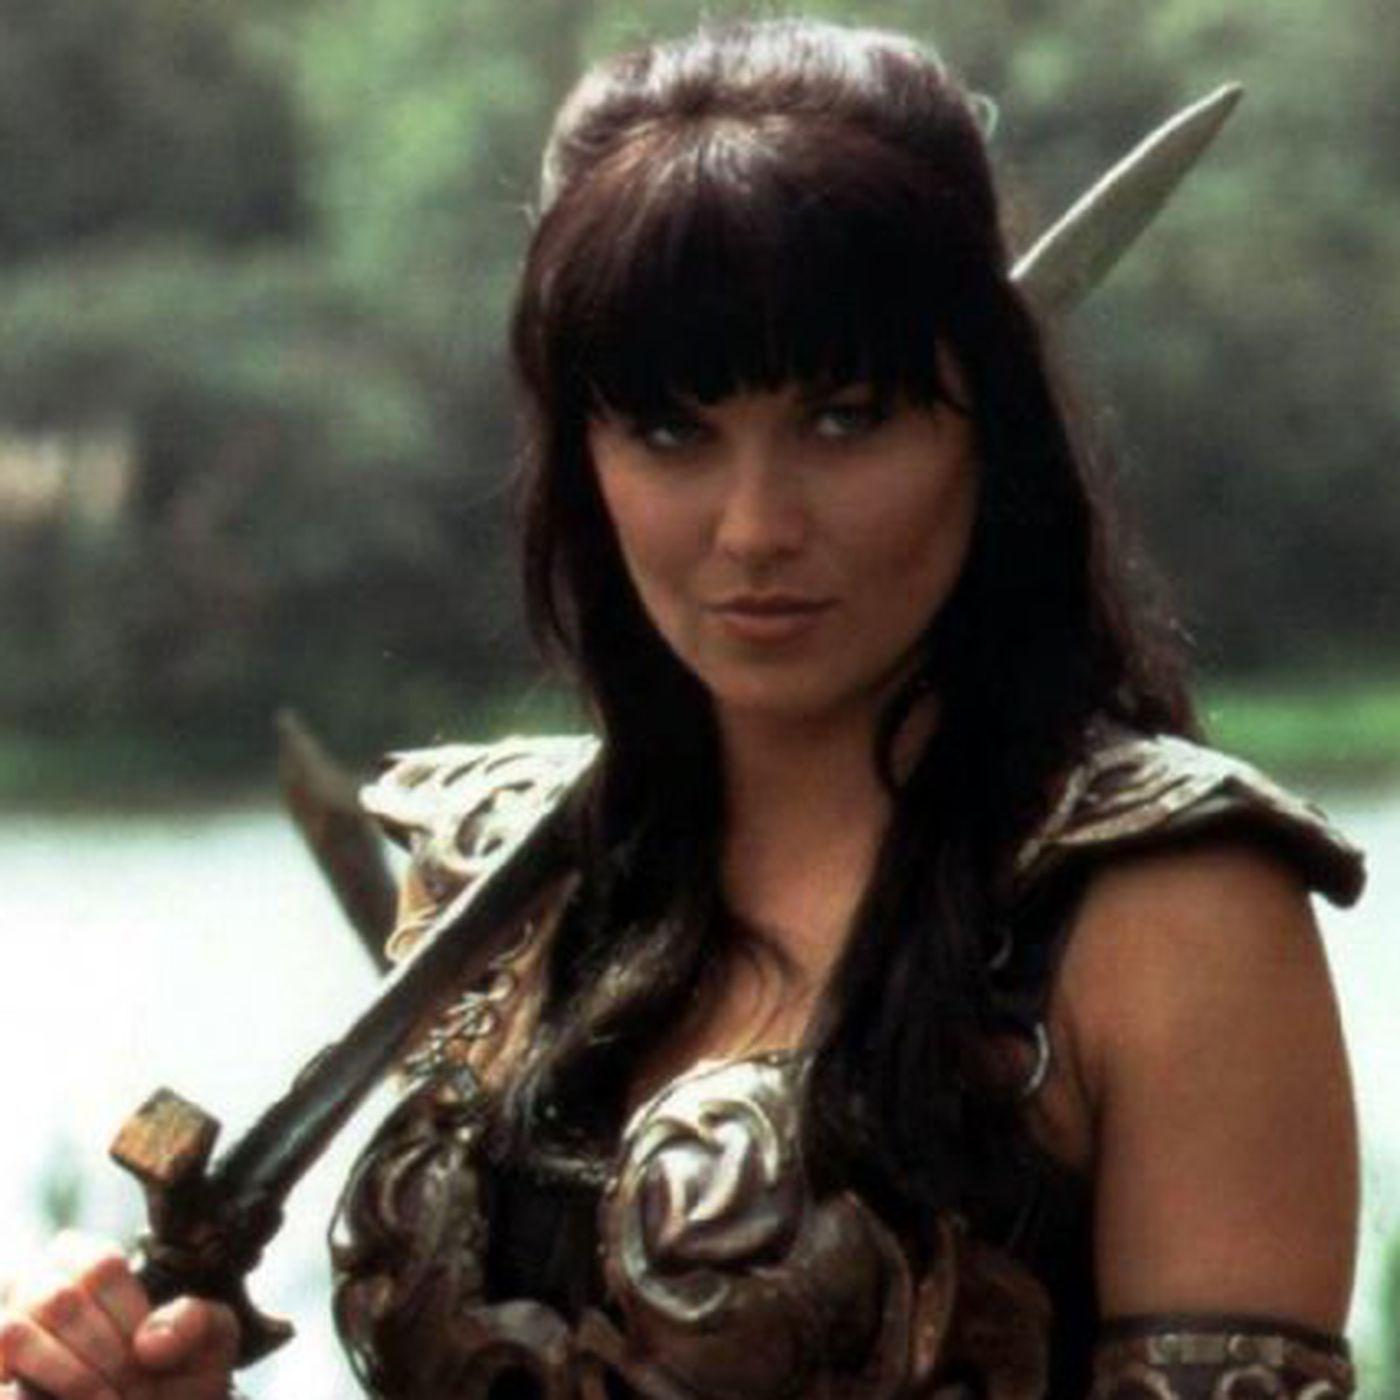 xena warrior princess vibe.0.0 20 Things You Never Knew About Xena: Warrior Princess